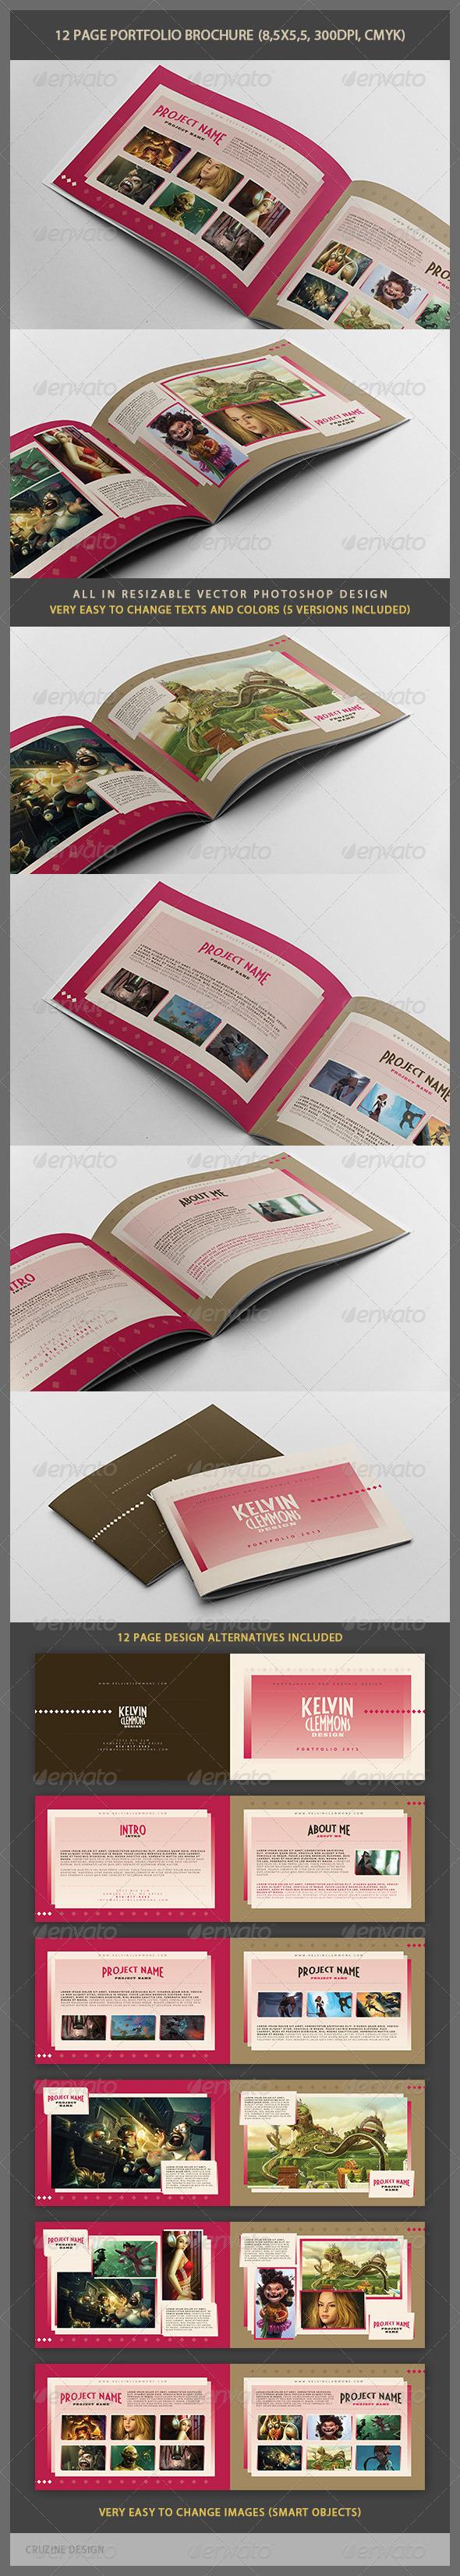 GraphicRiver 12 Page Portfolio Brochure 4086967